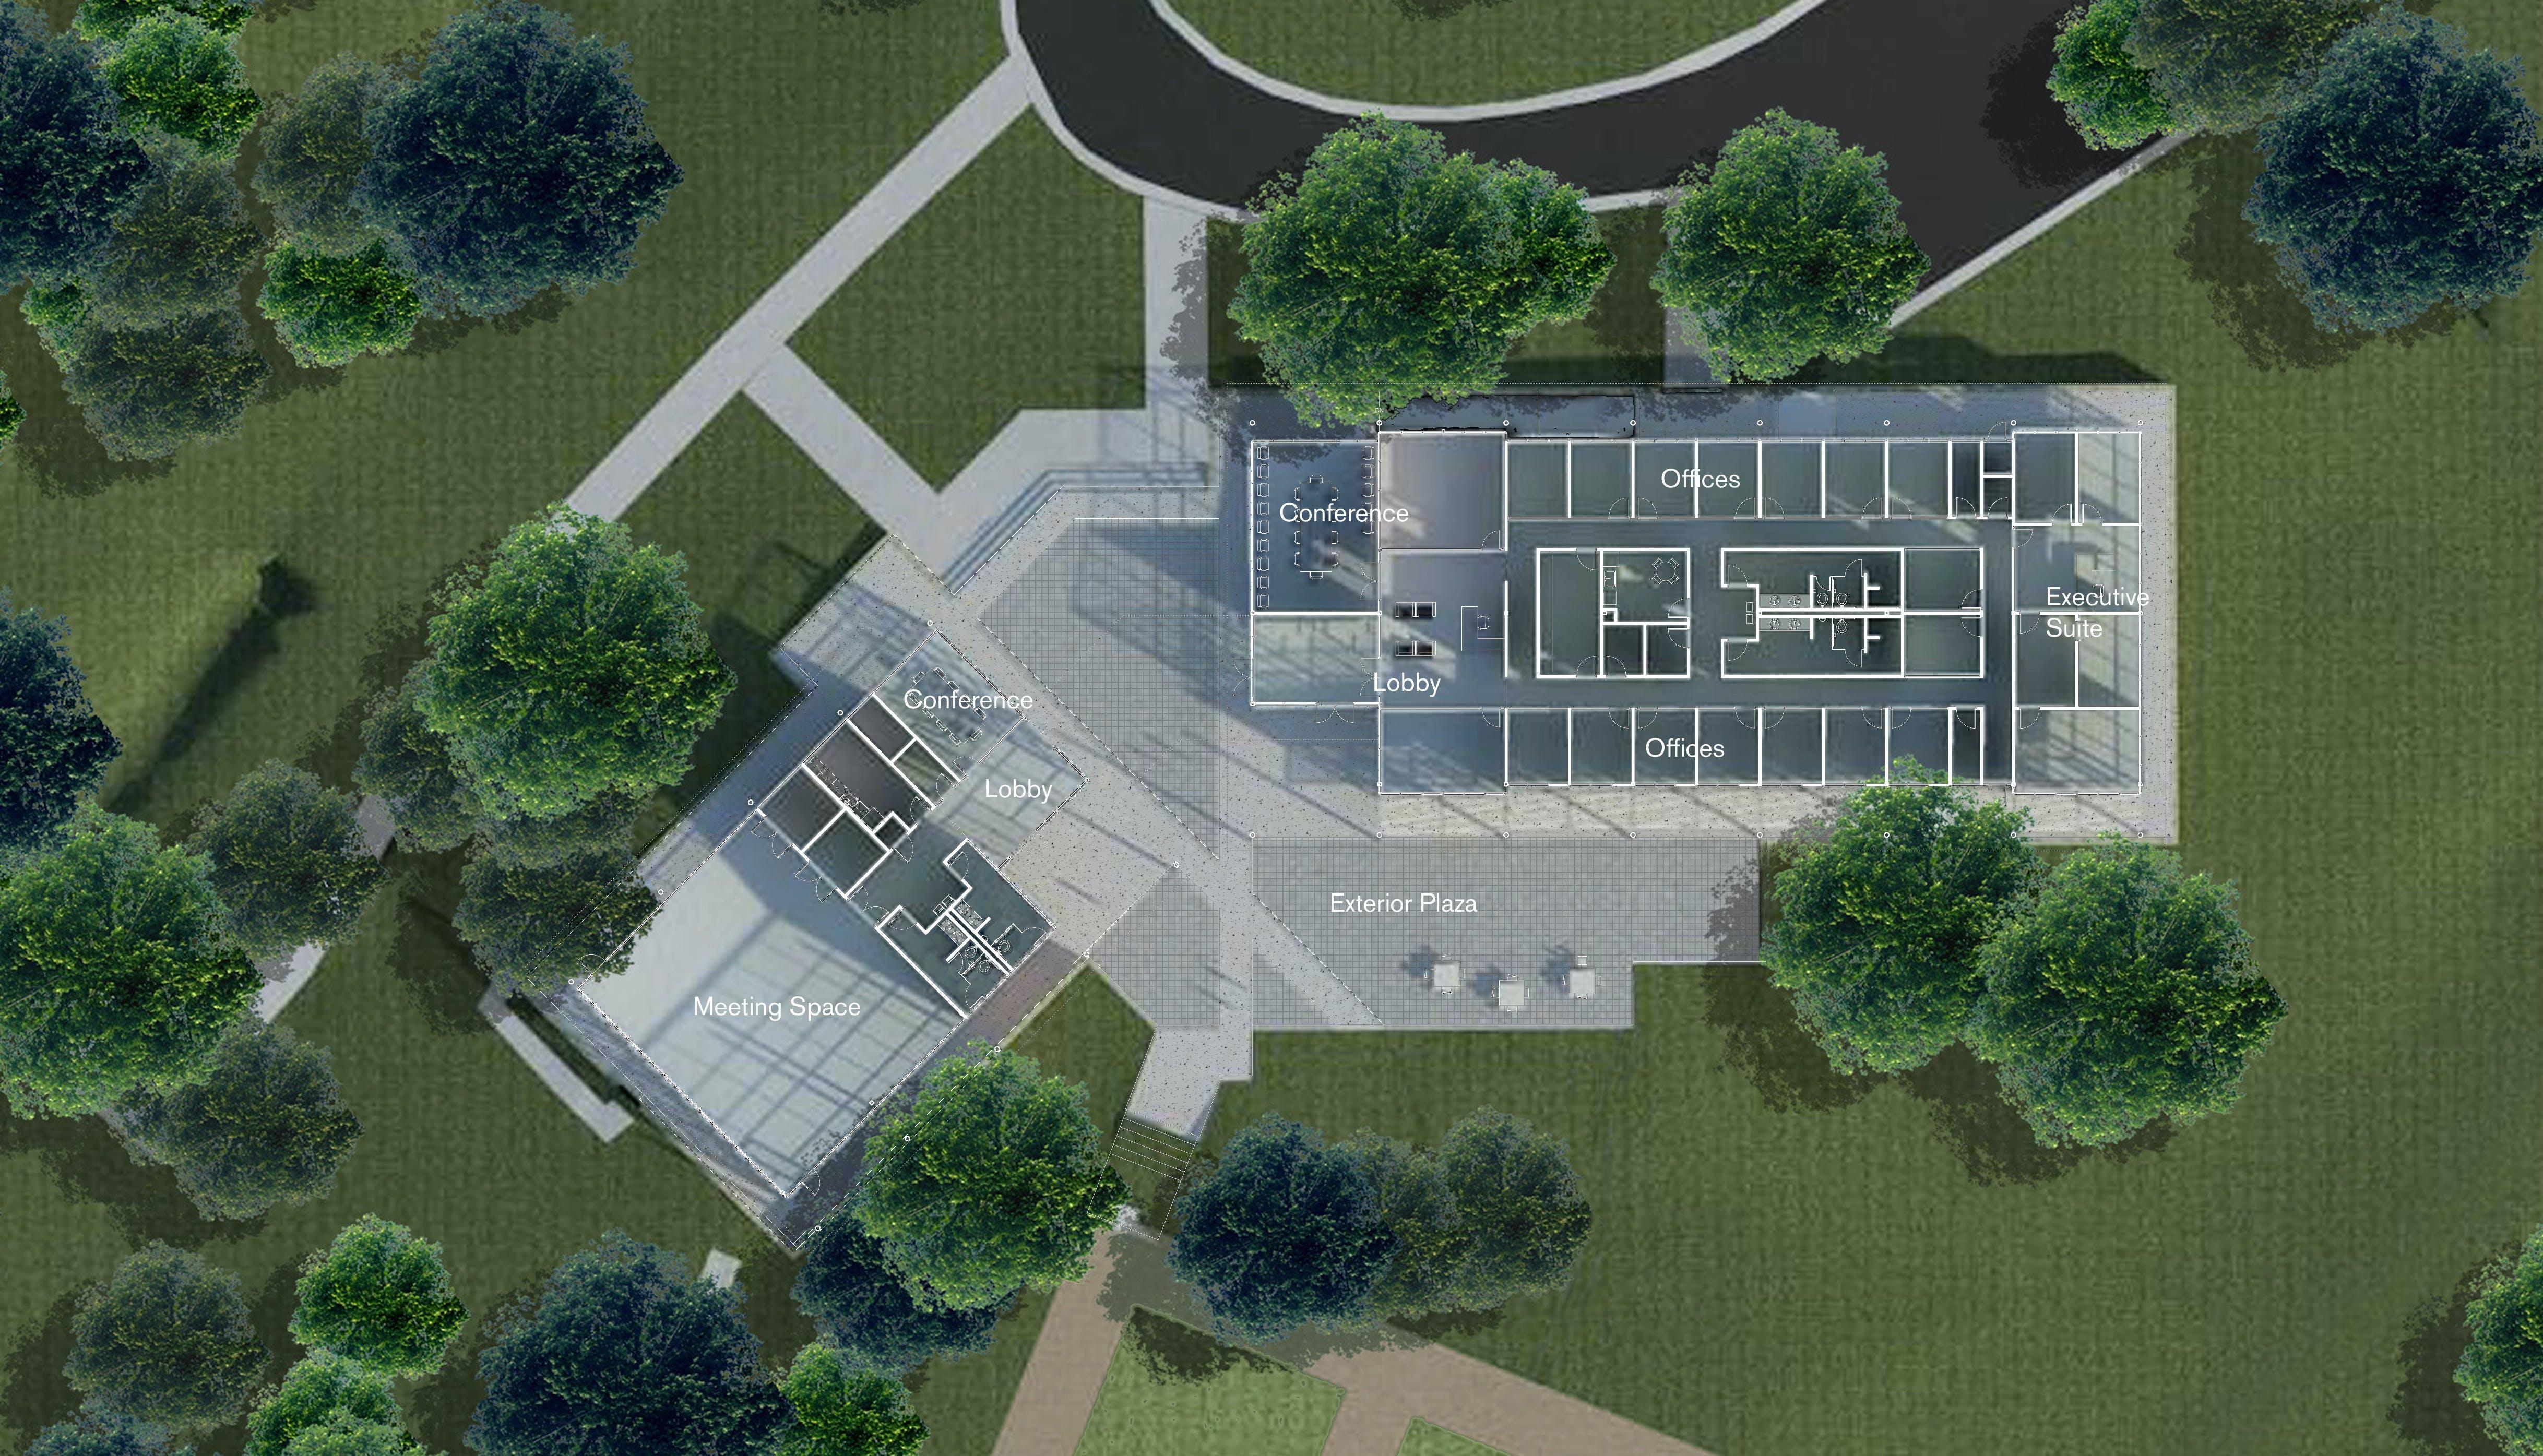 Parks And Recreation Administration Building Quackenbush